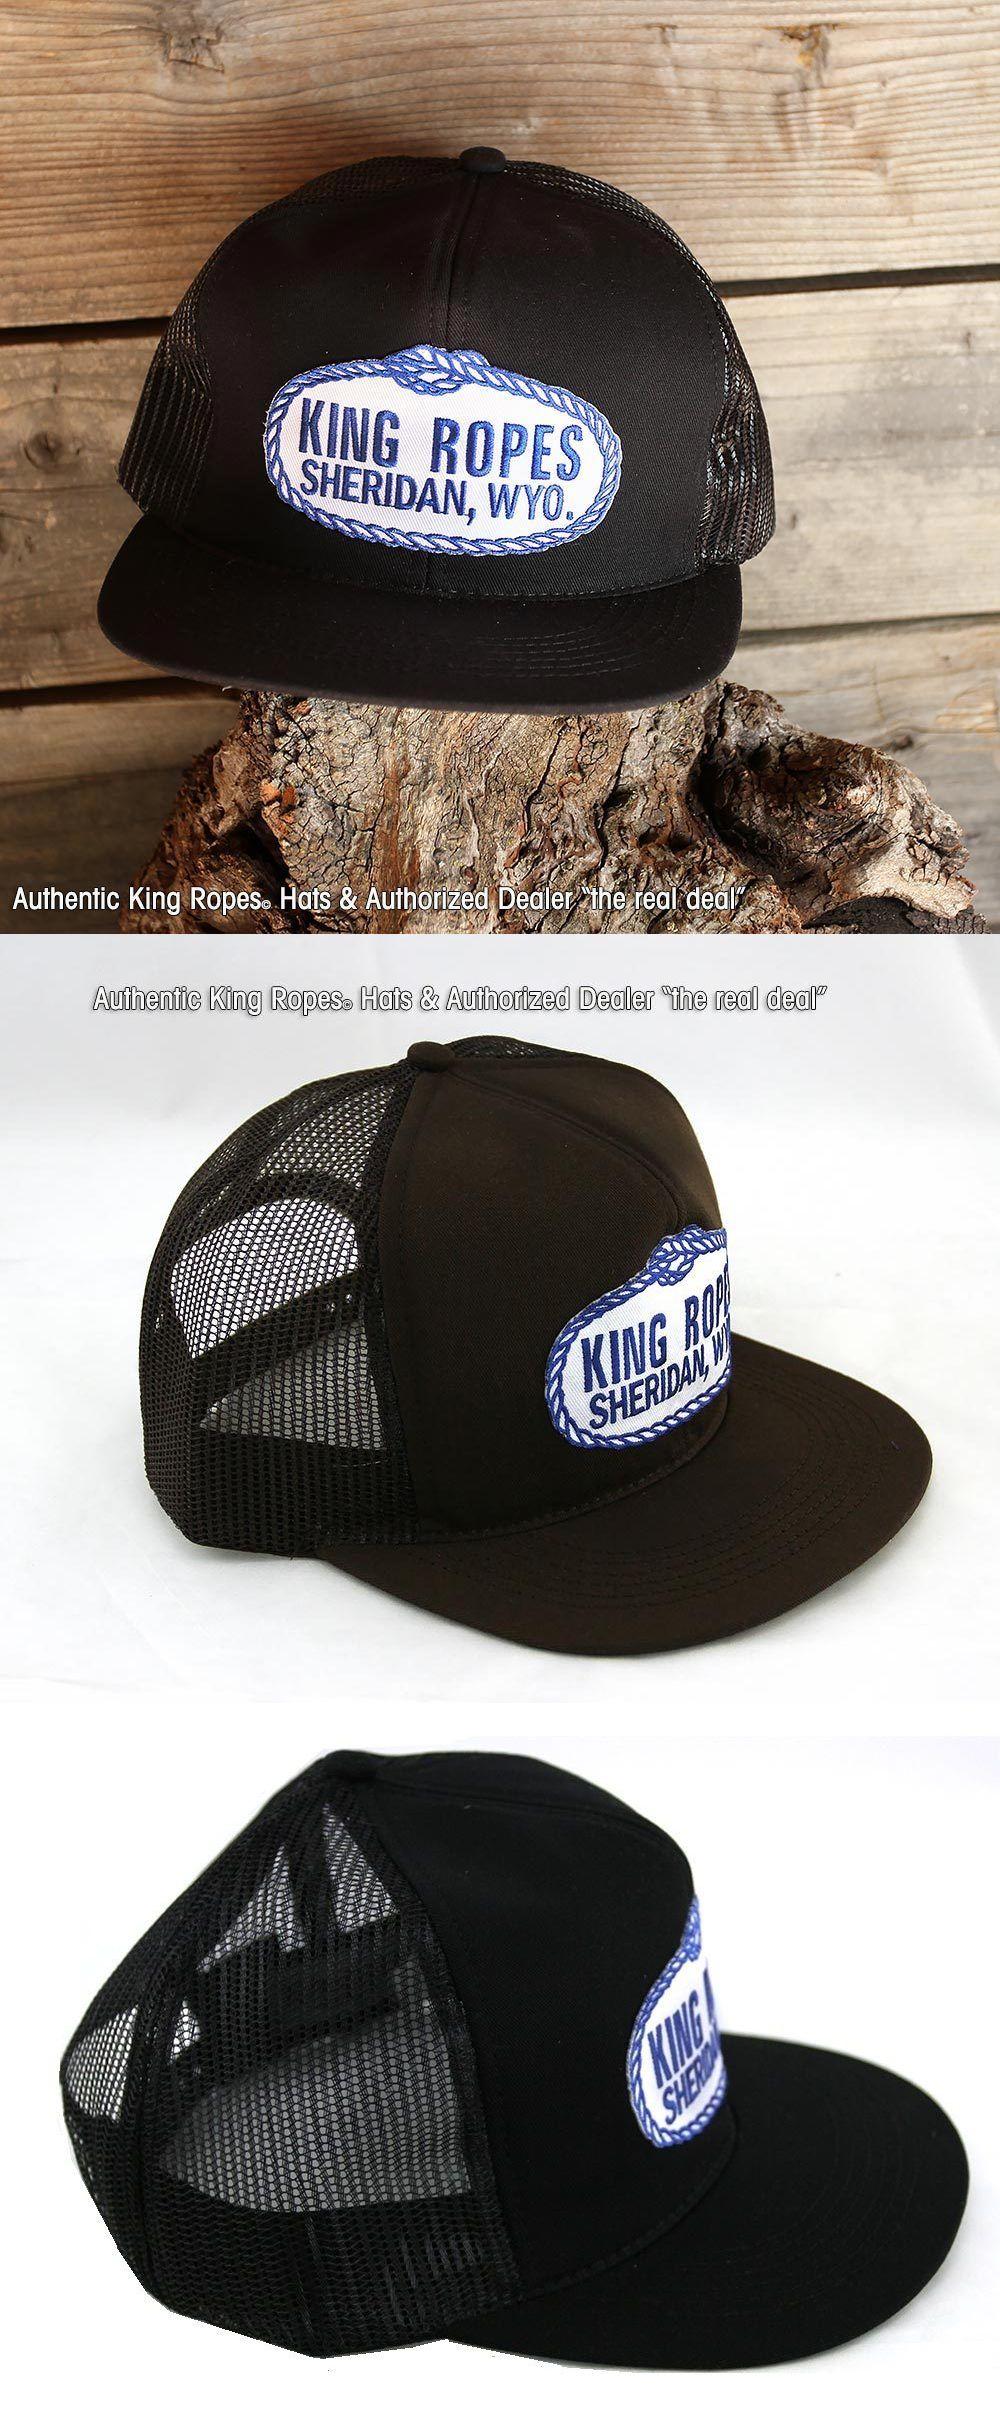 Riding Helmets 47269 King Ropes Rope Mesh Trucker Hat Black And Black Brand New Authorized Dealer Buy It Now Mesh Trucker Hat Riding Helmets Trucker Hat